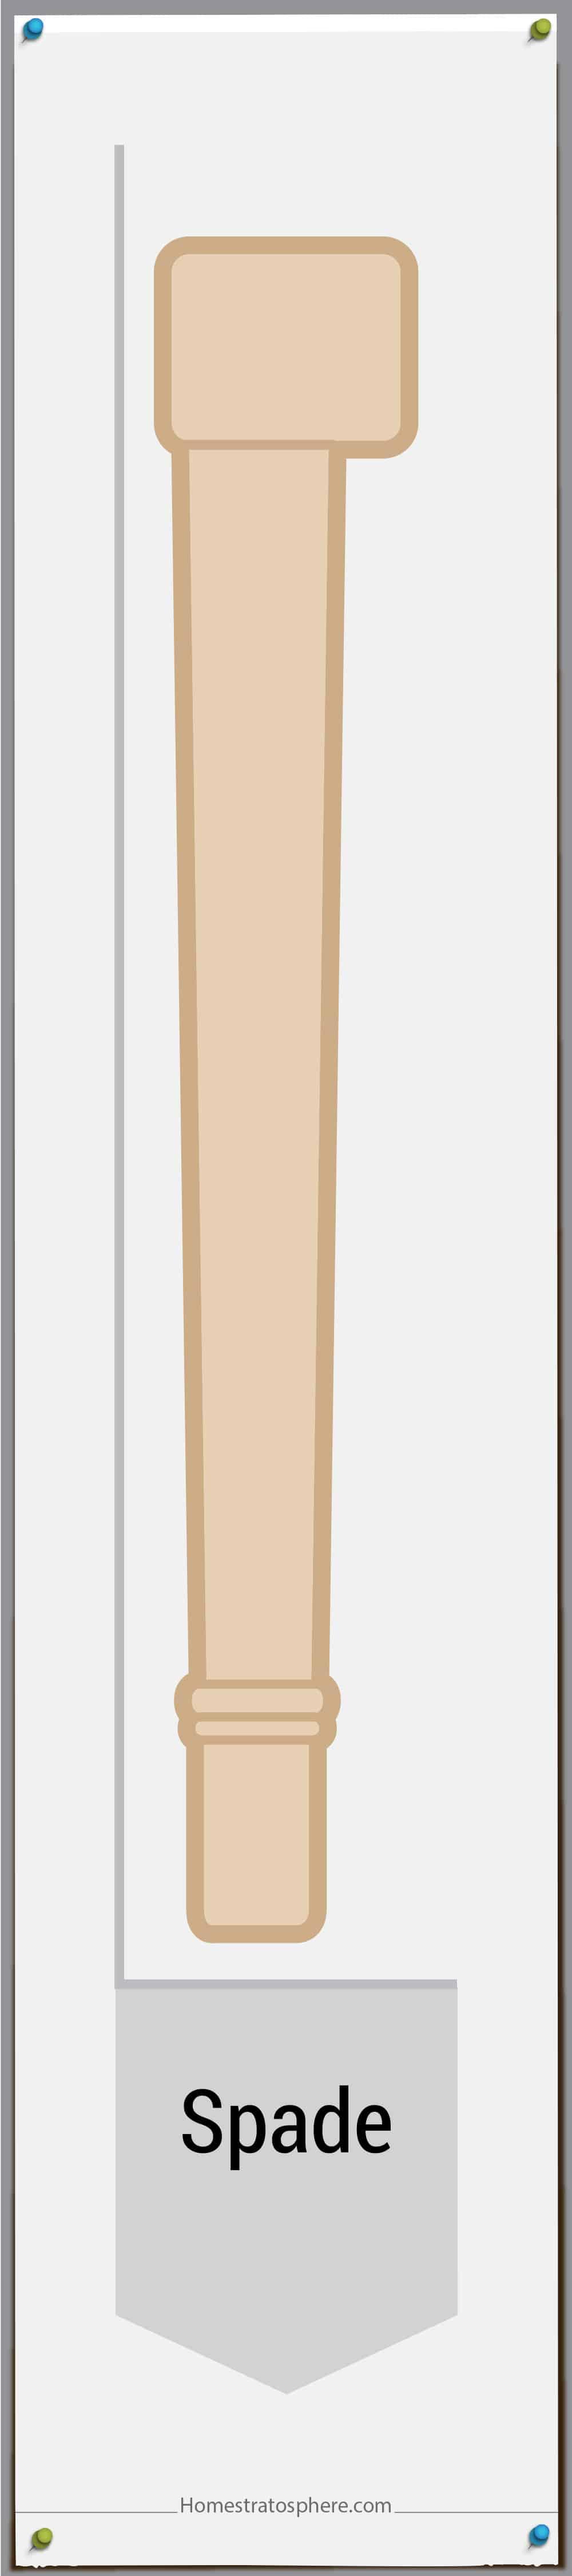 Spade leg style